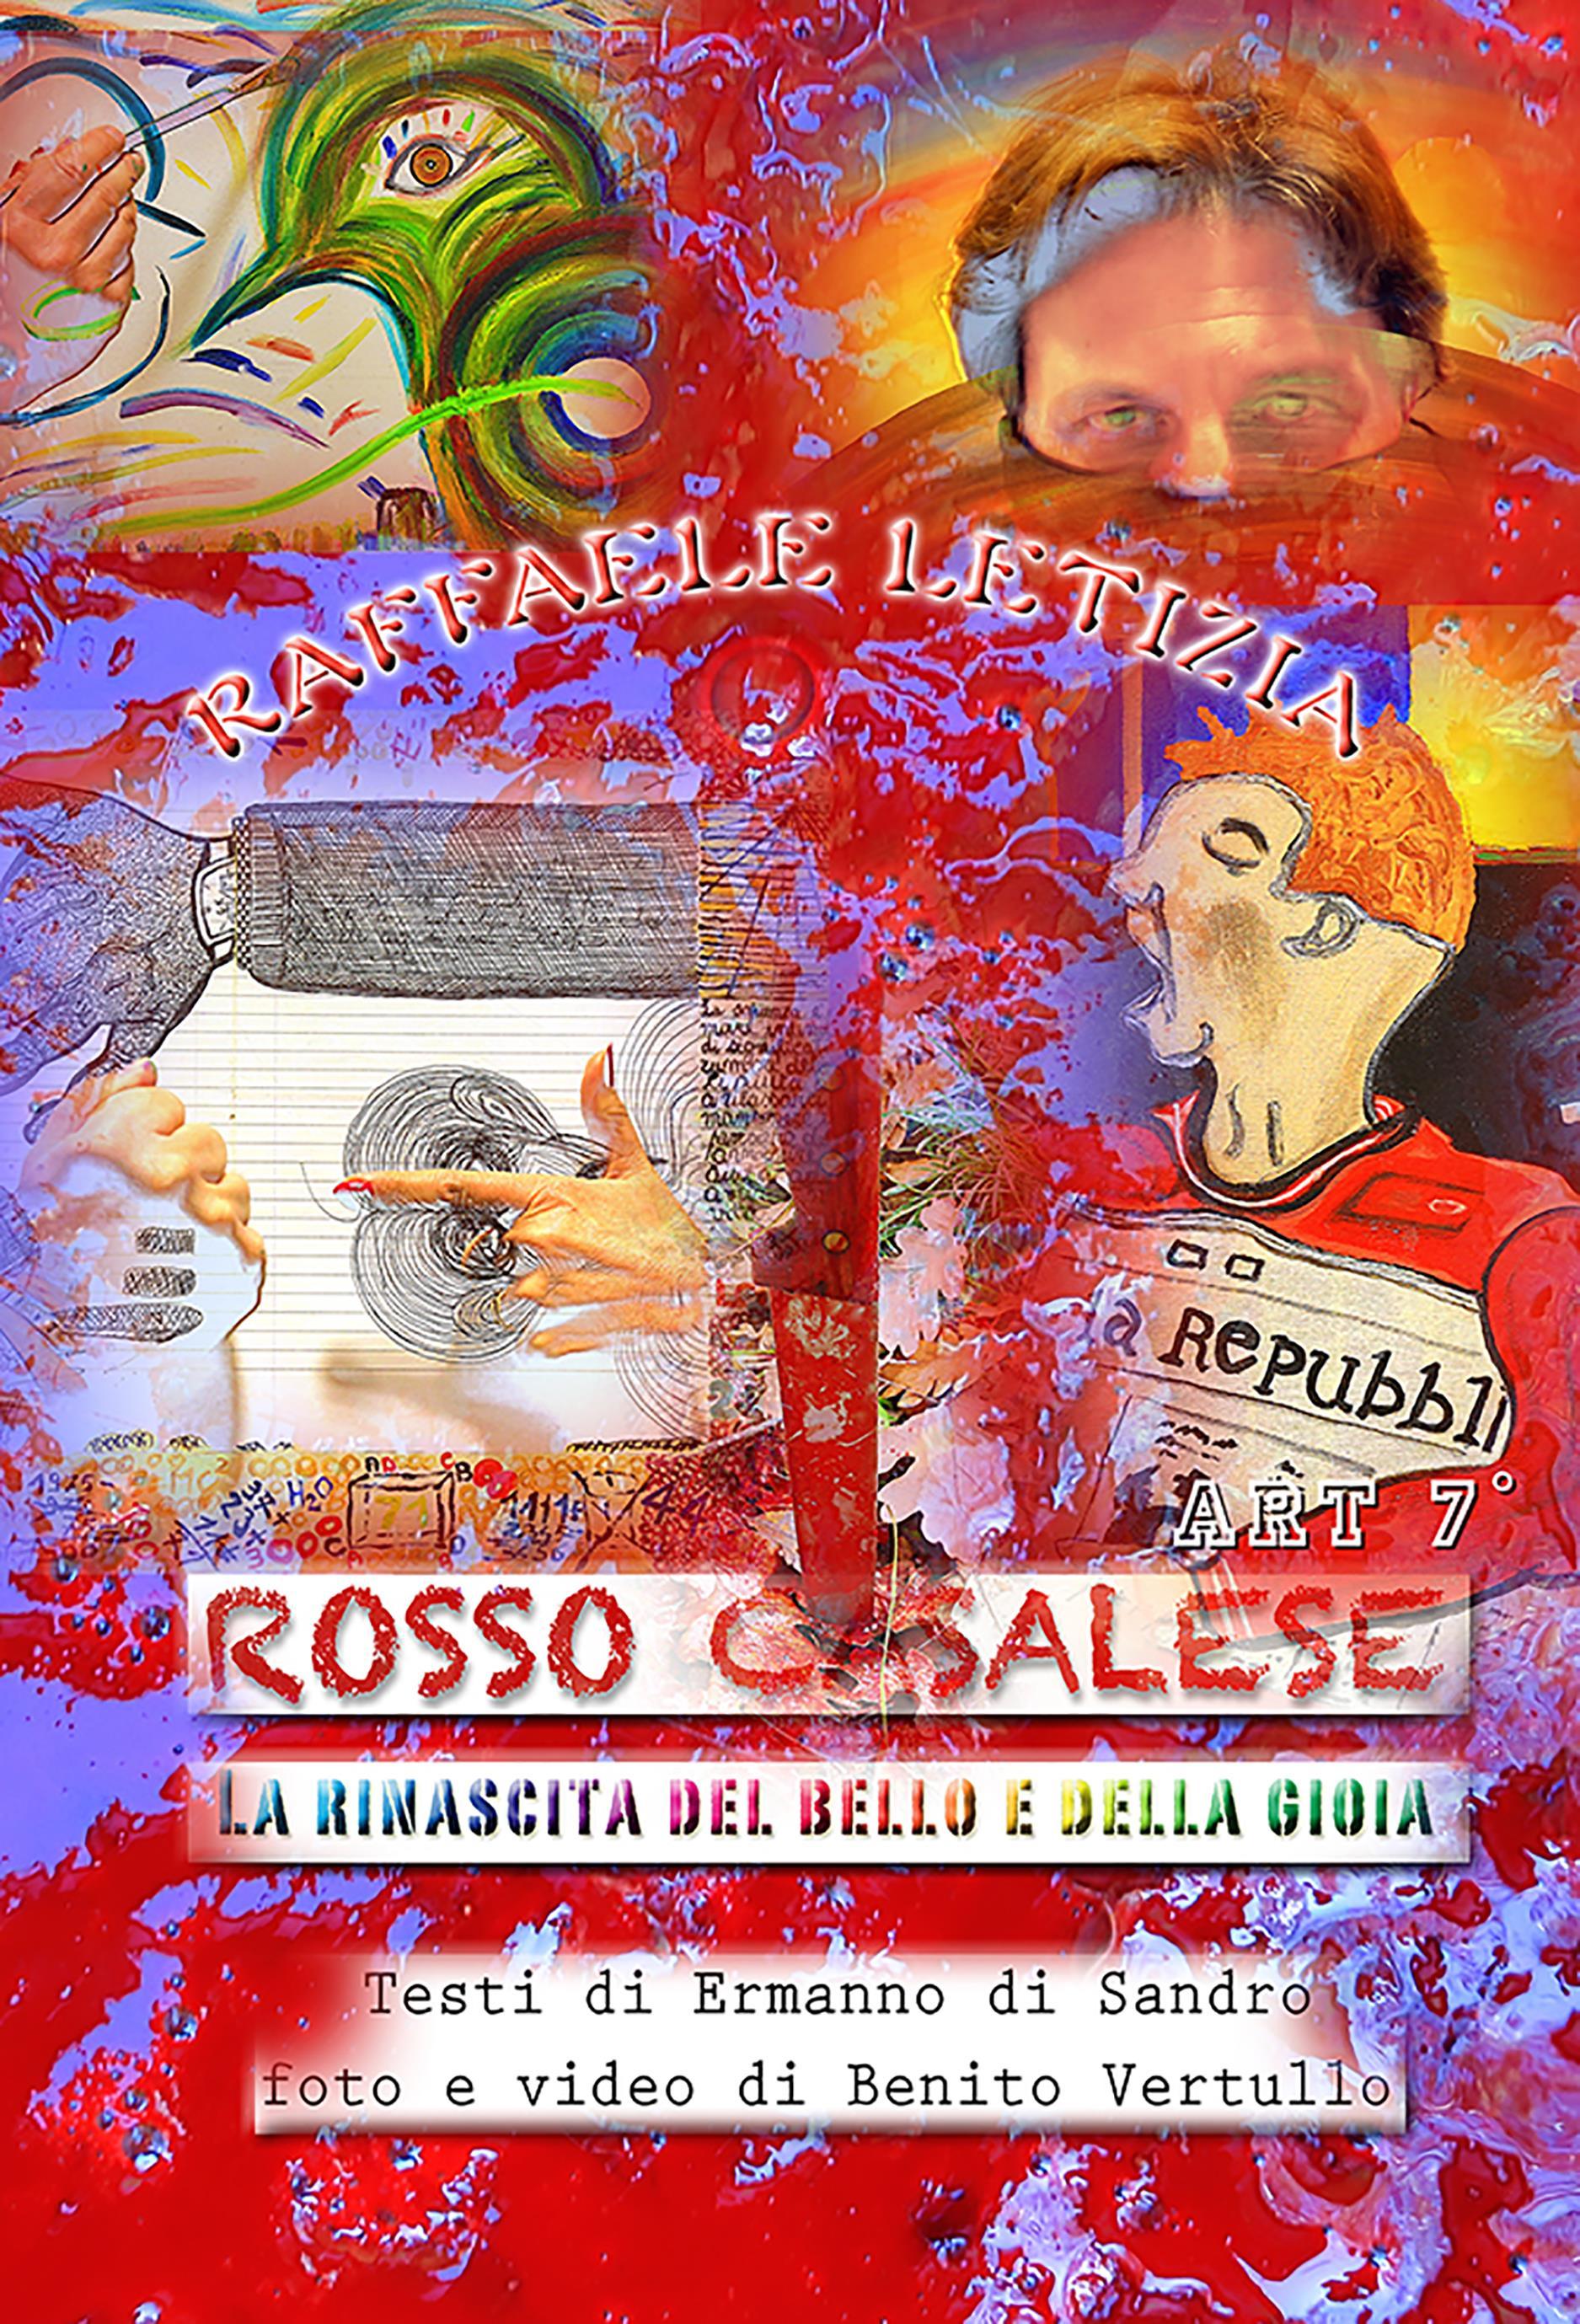 Rosso Casalese Art 7° Raffaele Letizia